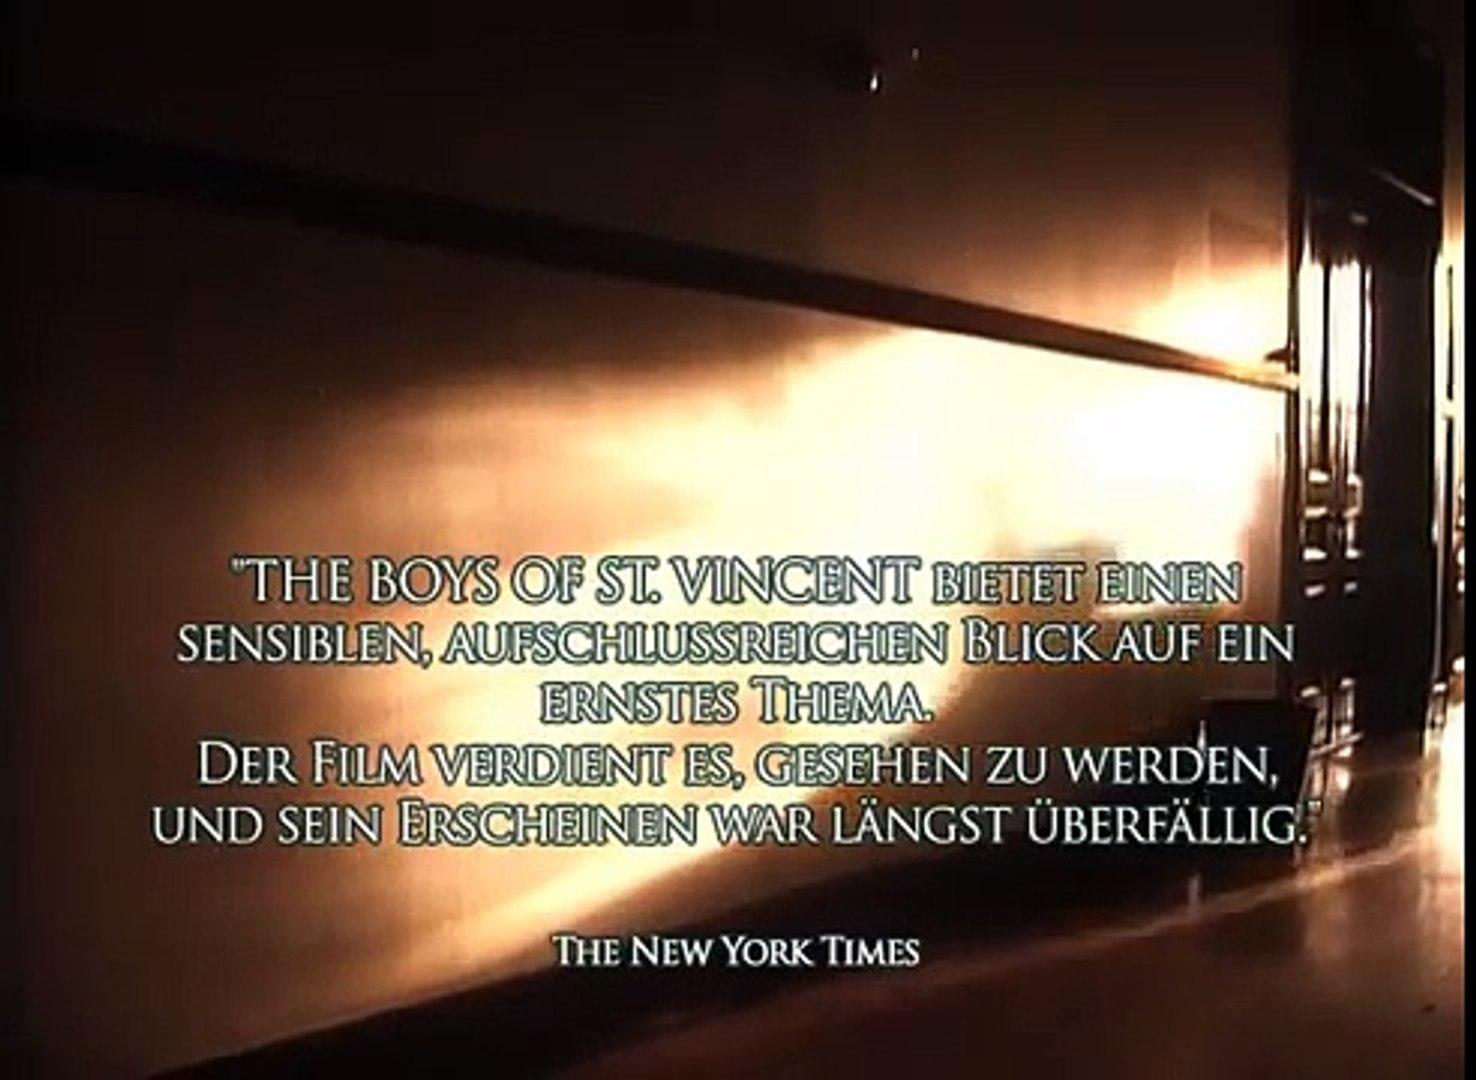 The Boys of St.Vincent (1992) Trailer deutsch